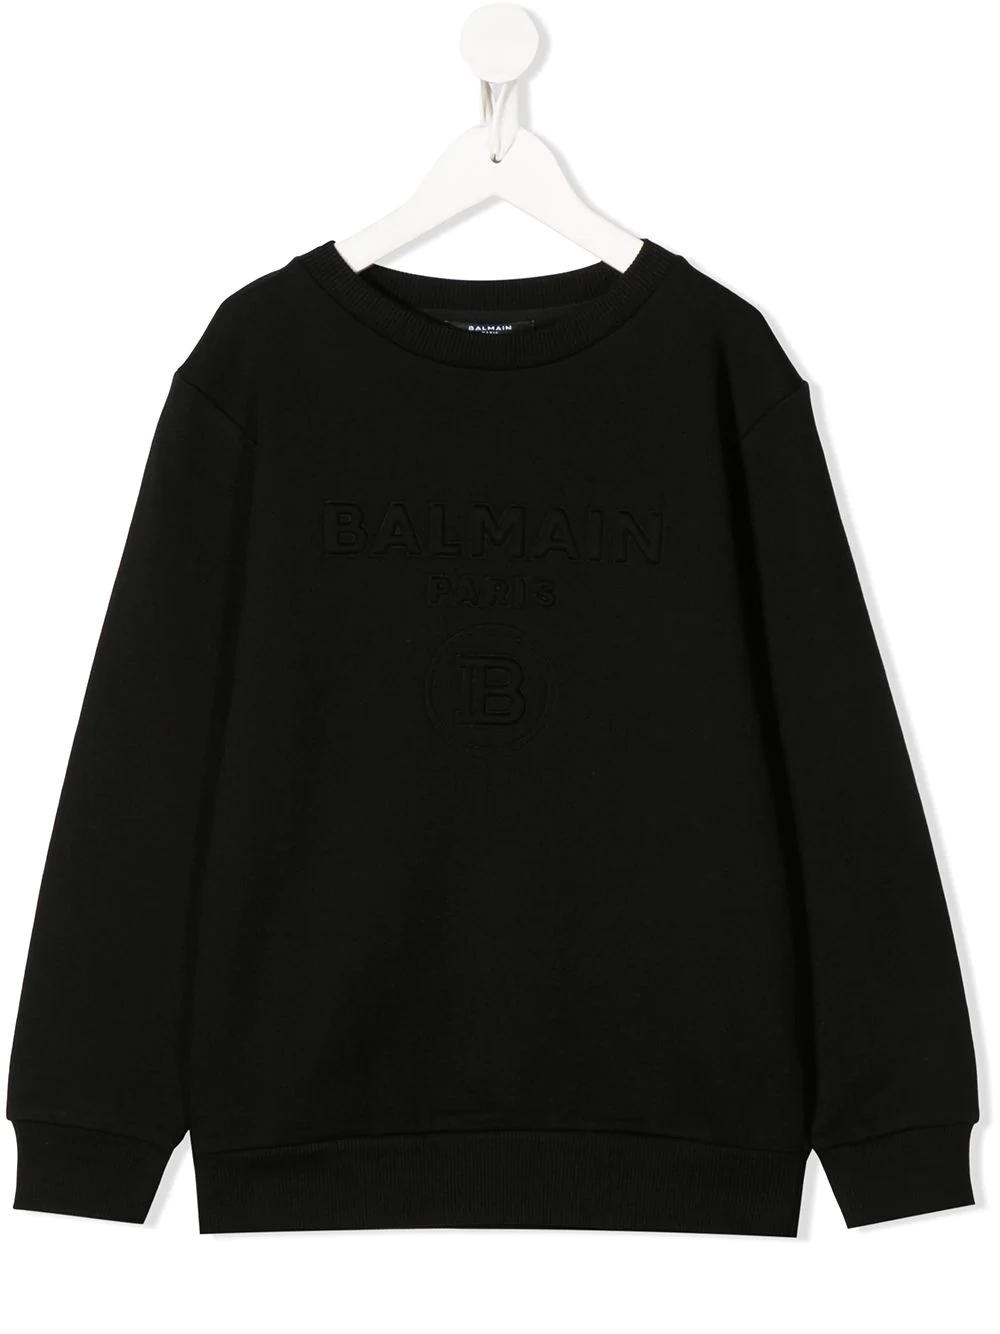 Sweatshirt Balmain kids  BALMAIN PARIS KIDS   -108764232   6M4740MX020930